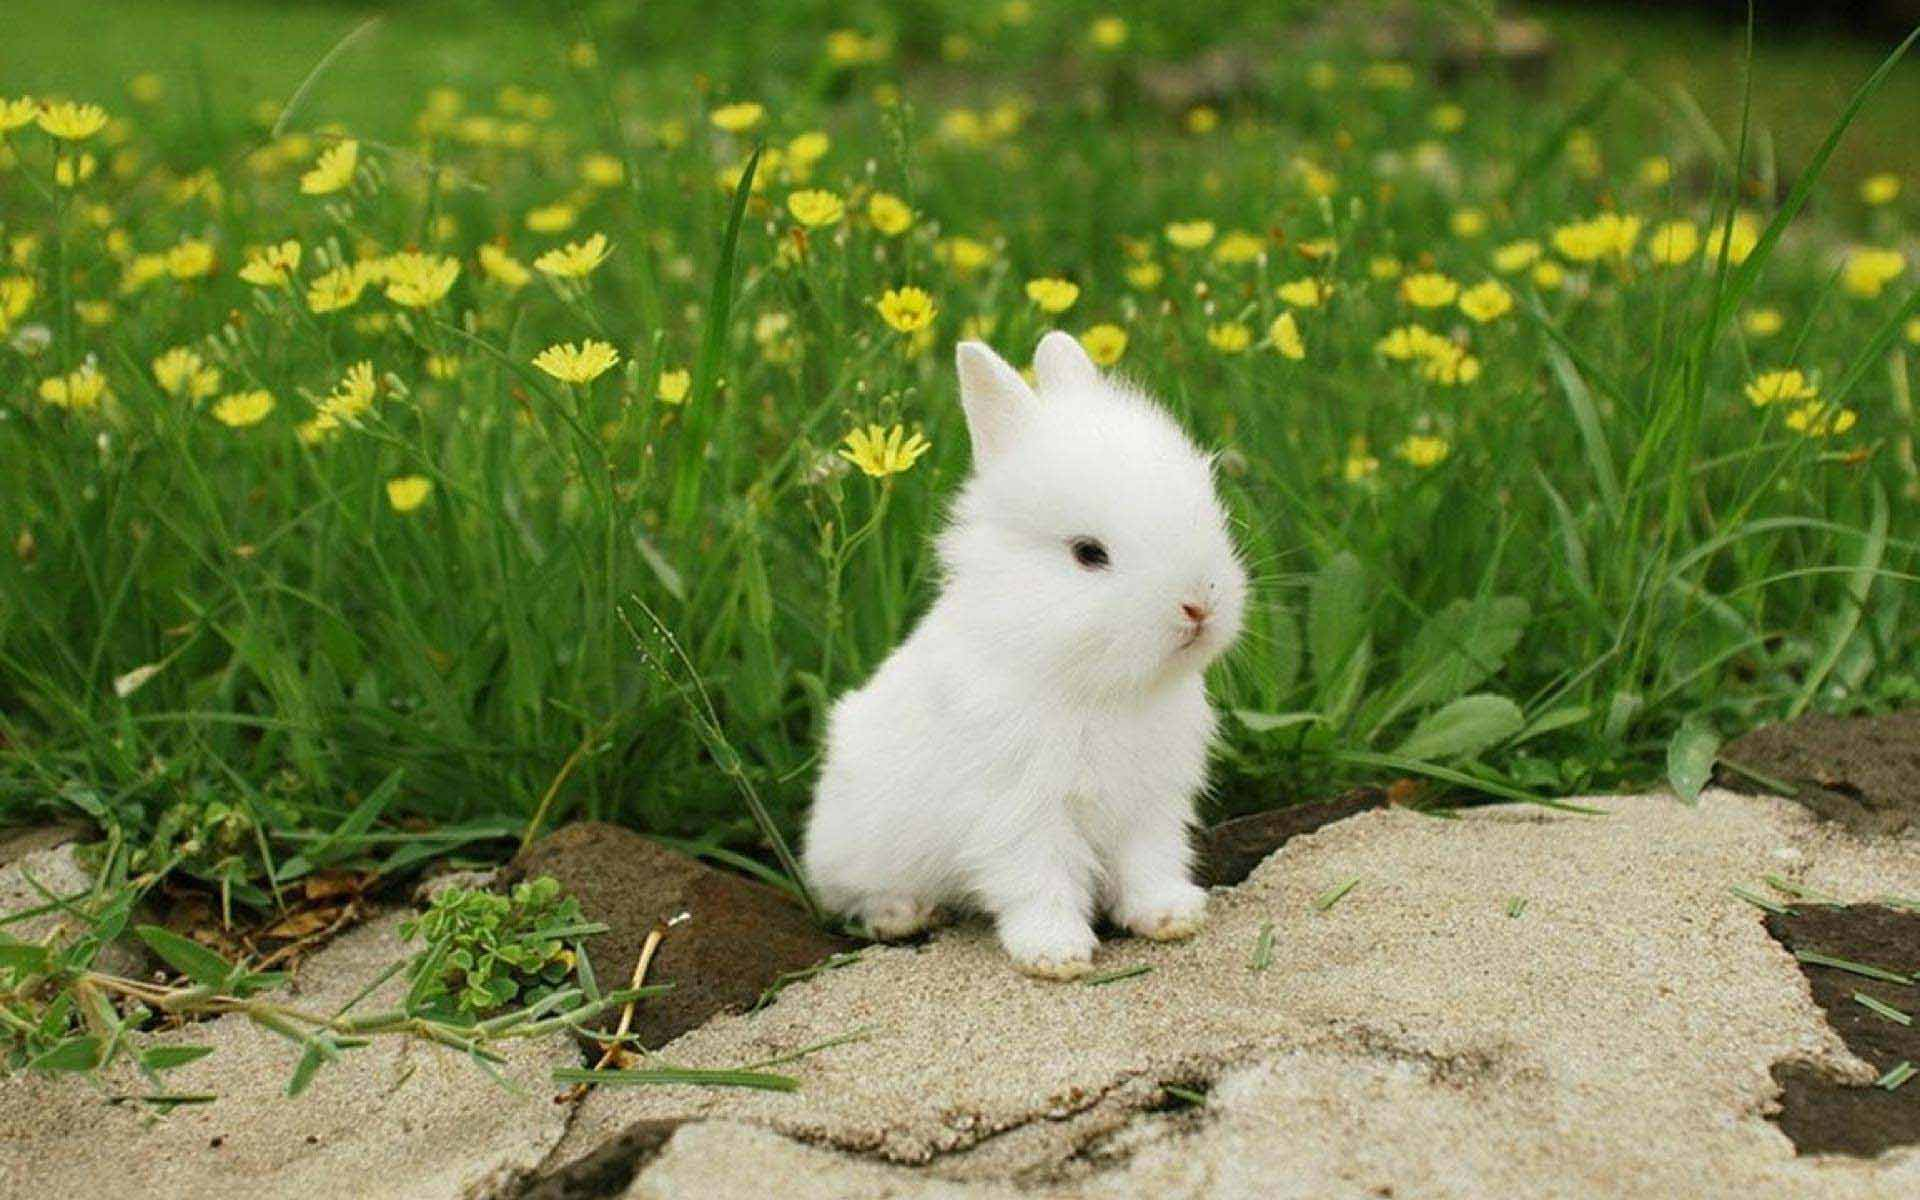 Cute Bunny Wallpapers - Top Free Cute ...